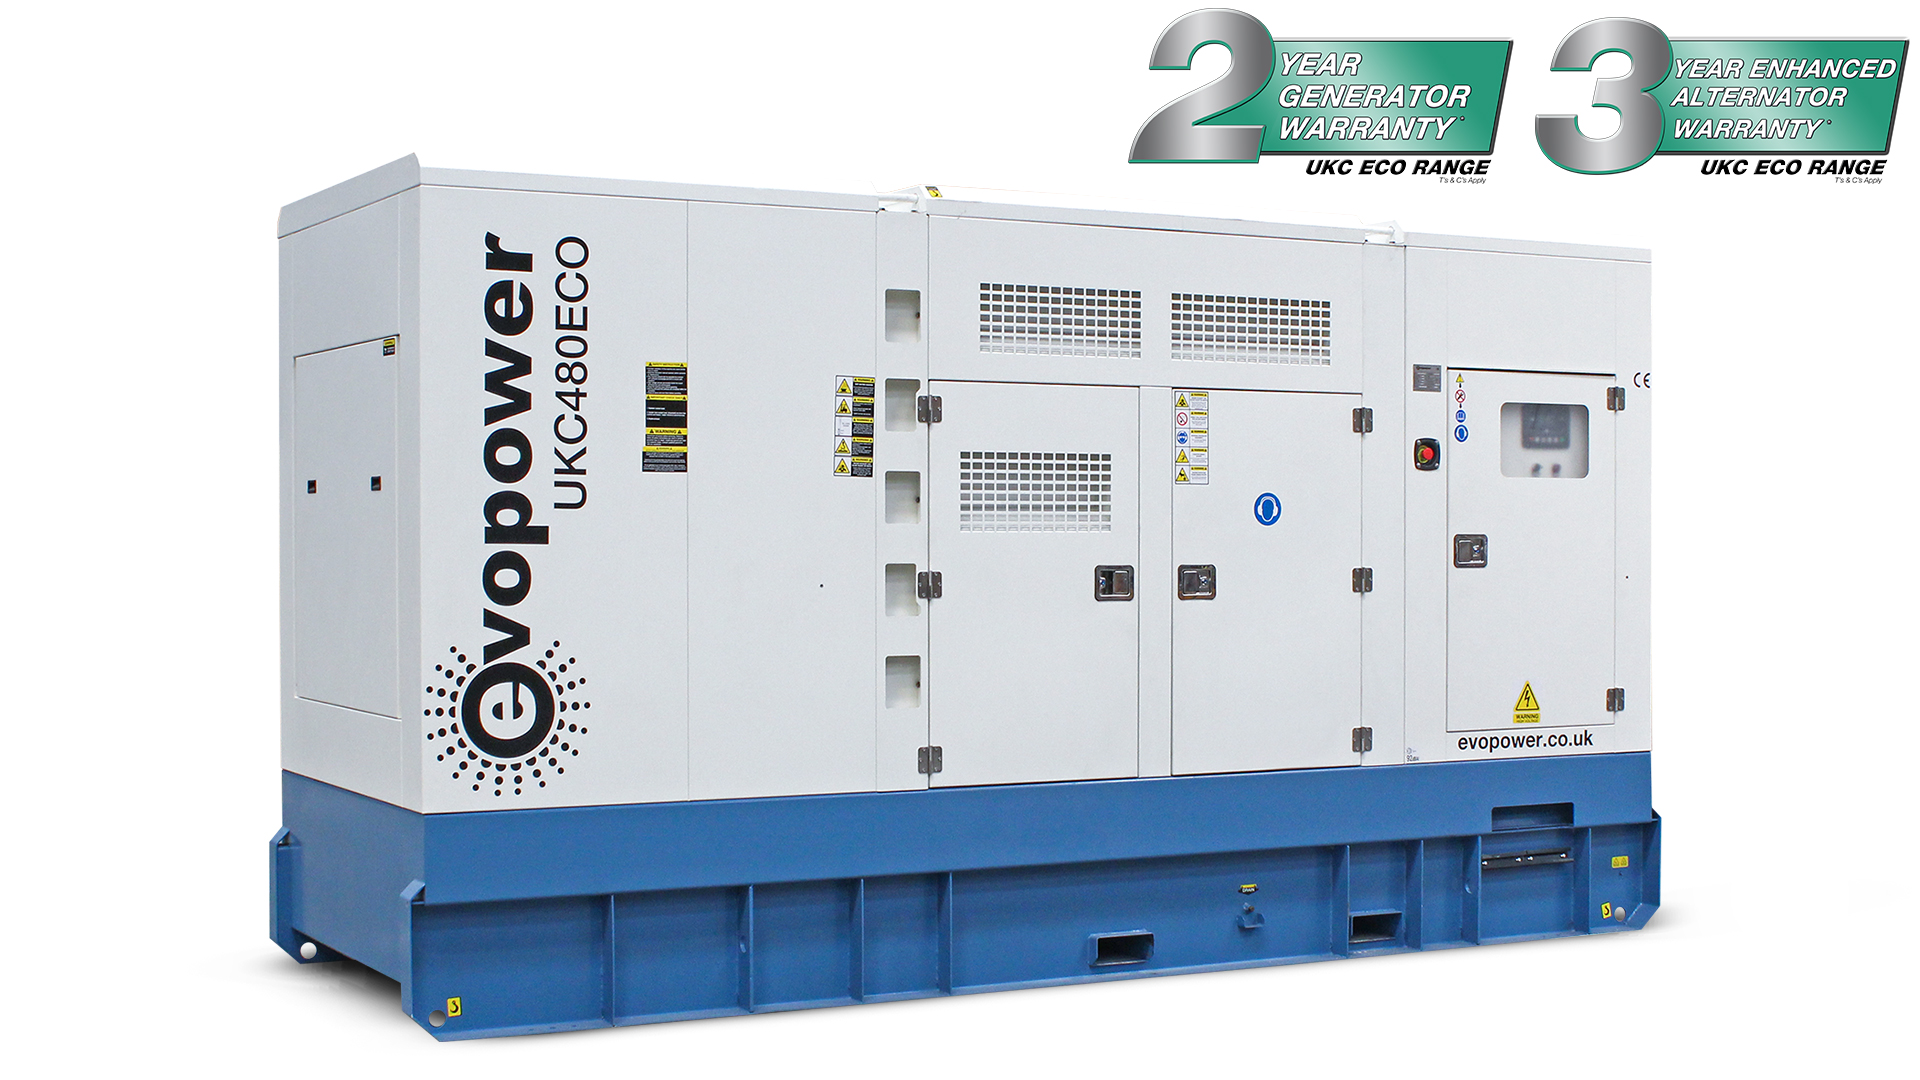 UKC480ECO-LR 480kVA Diesel Generator Main Image